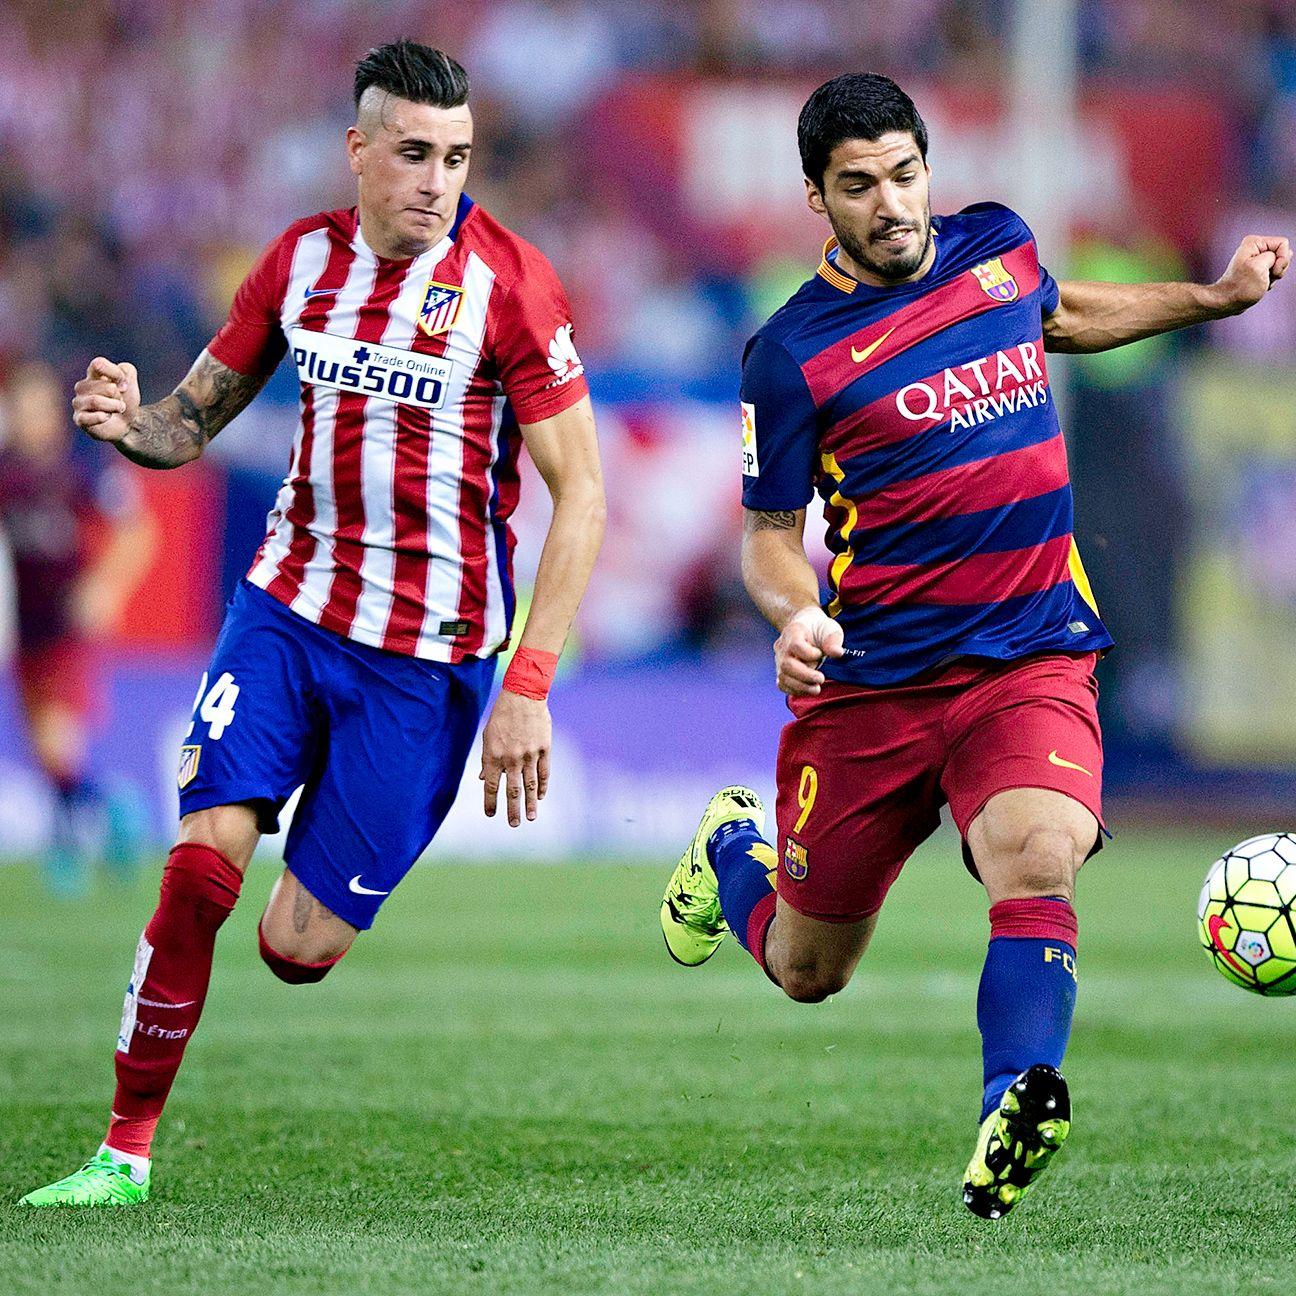 Atletico centre-back Jose Maria Gimenez did well to keep countryman Luis Suarez under wraps.